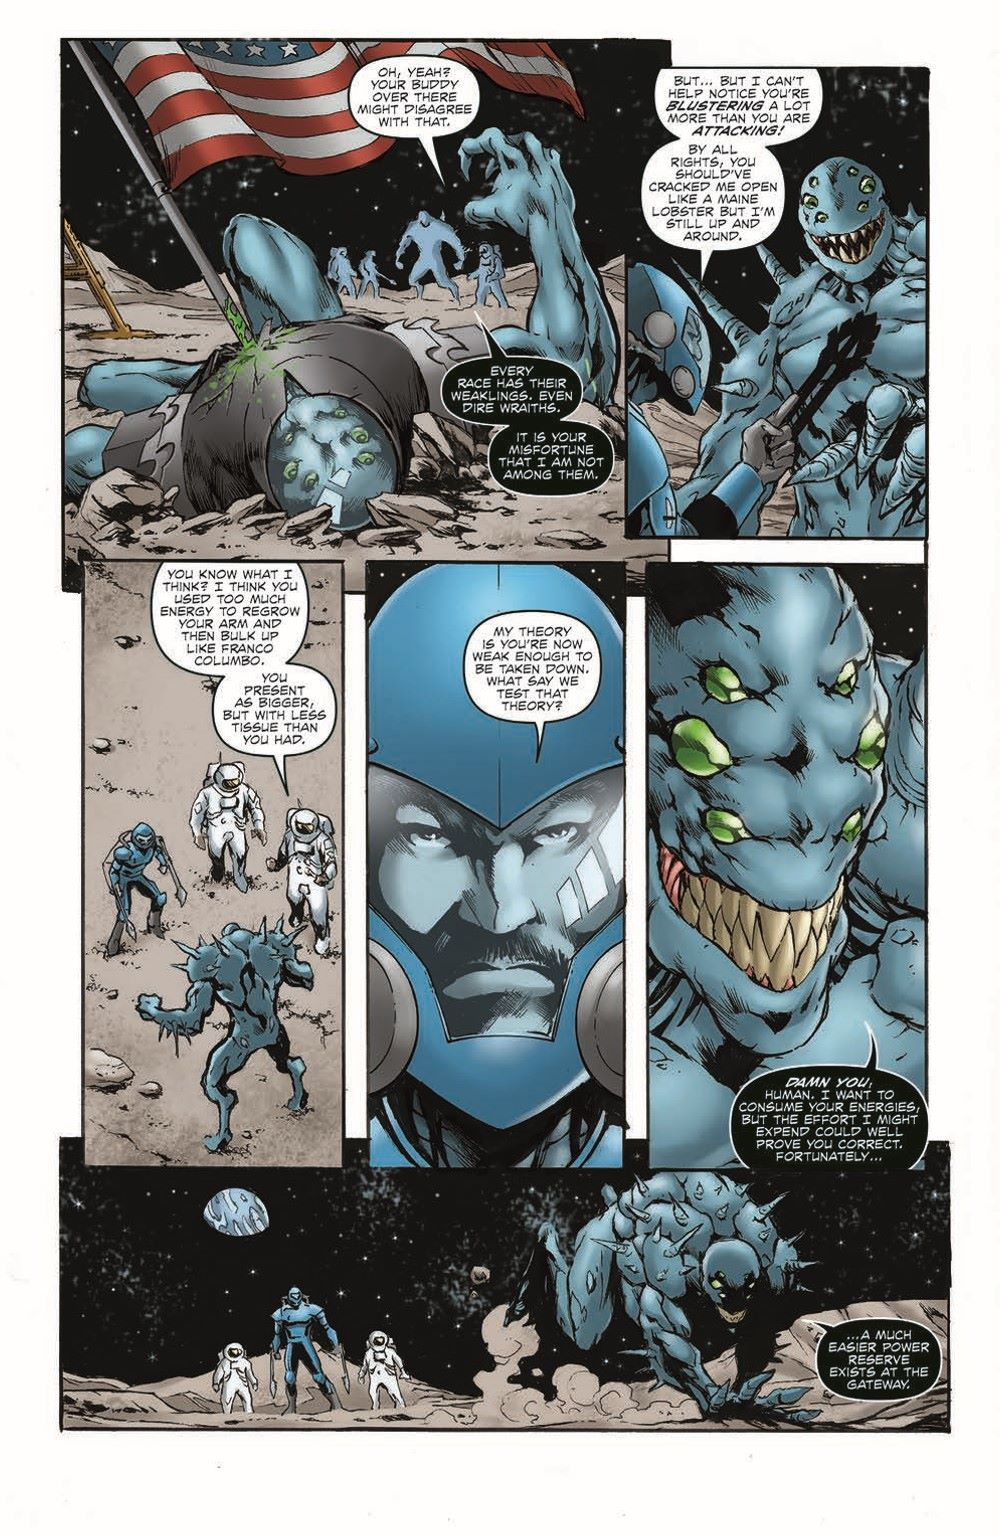 DireWraiths03_pr-5 ComicList Previews: ROM DIRE WRAITHS #3 (OF 3)